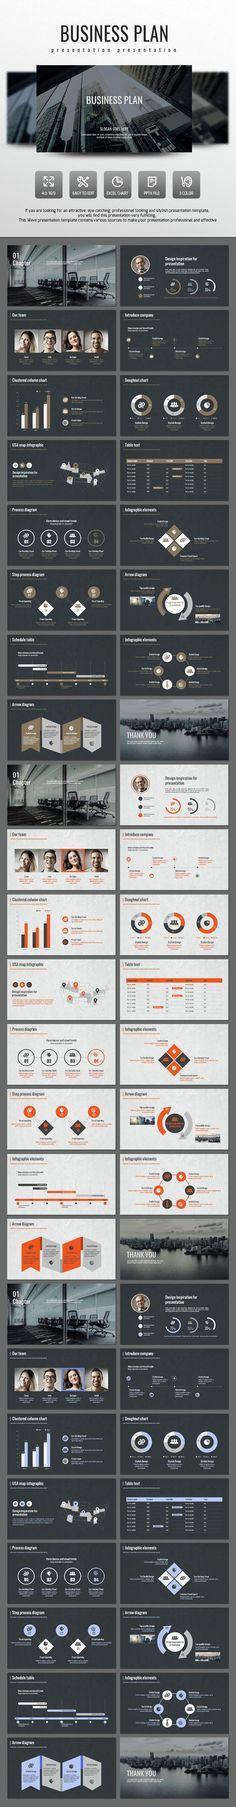 Business Plan (PowerPoint Templates)